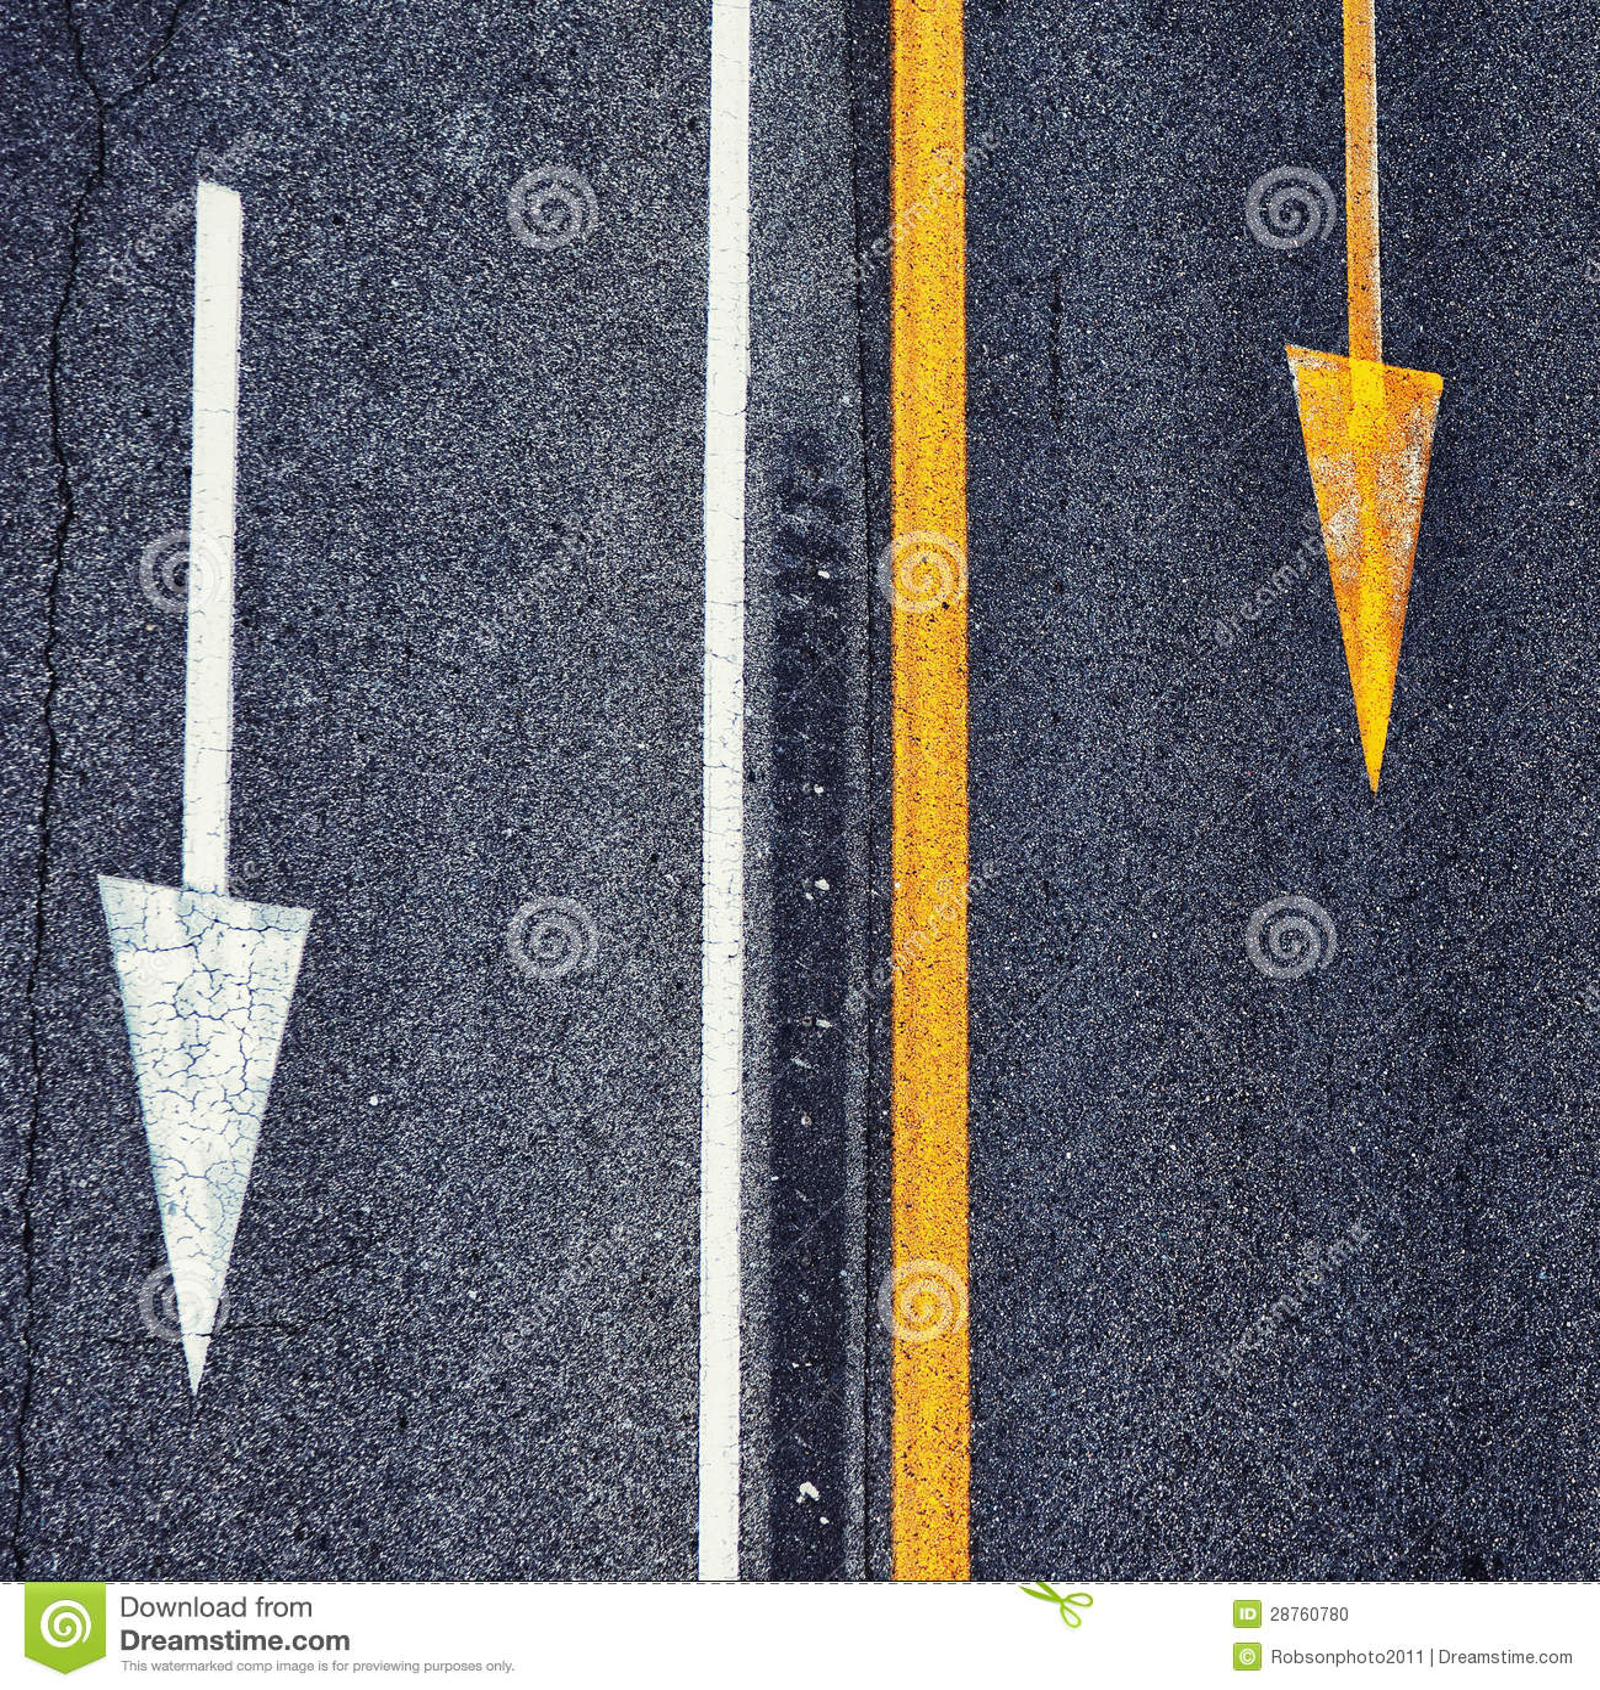 Street Asphalt Sign Arrows Stock Photo - Image: 28760780